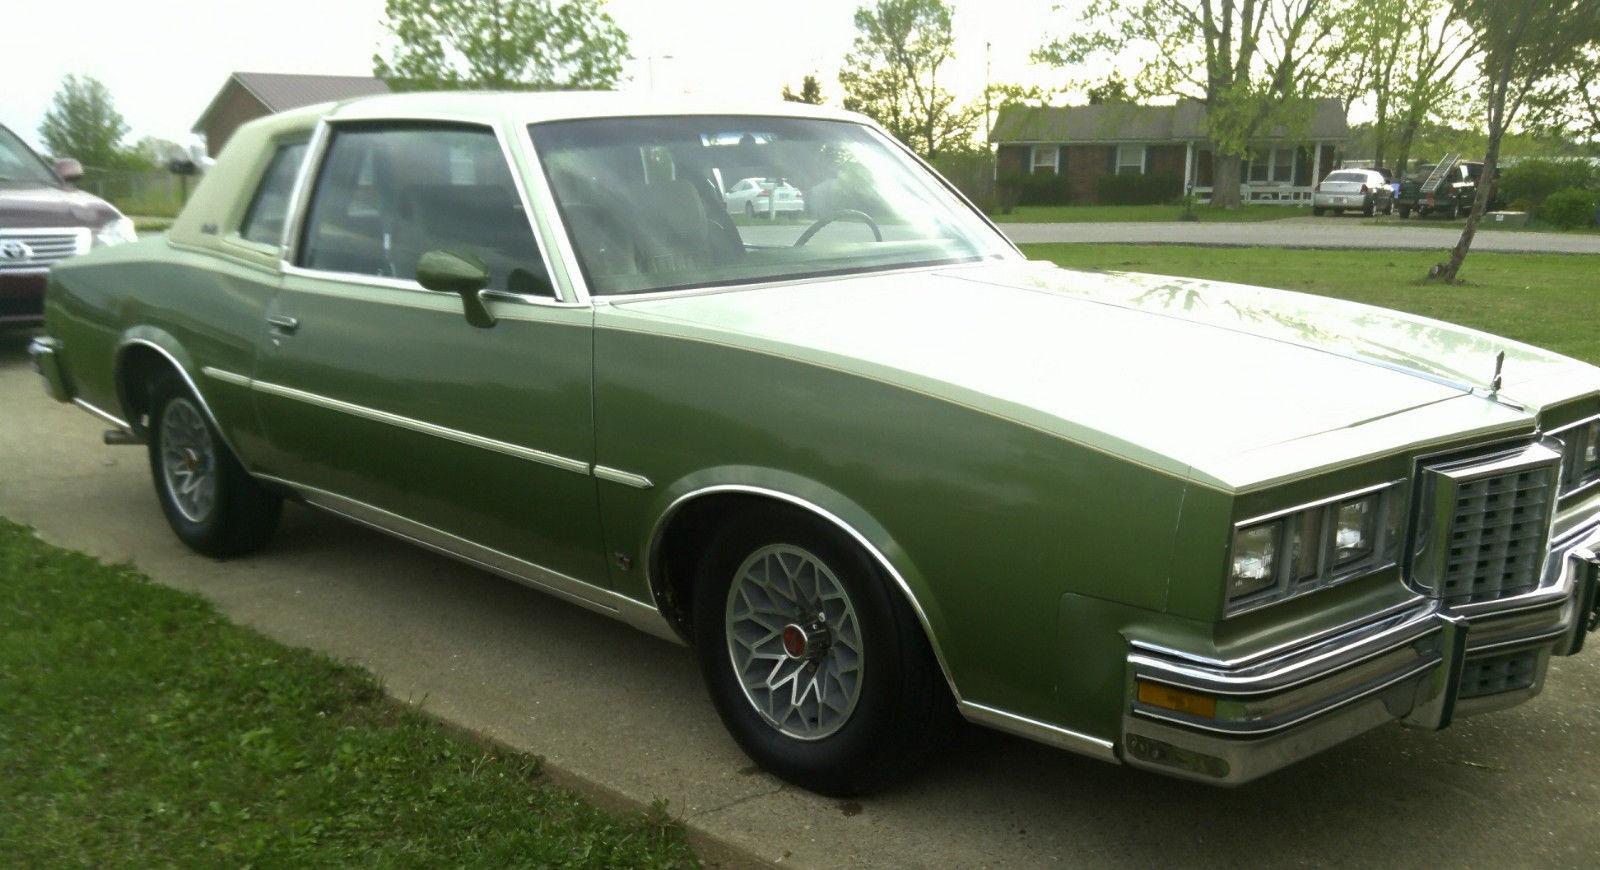 2016 Chevy Malibu For Sale >> Green And Grand! 1979 Pontiac Grand Prix